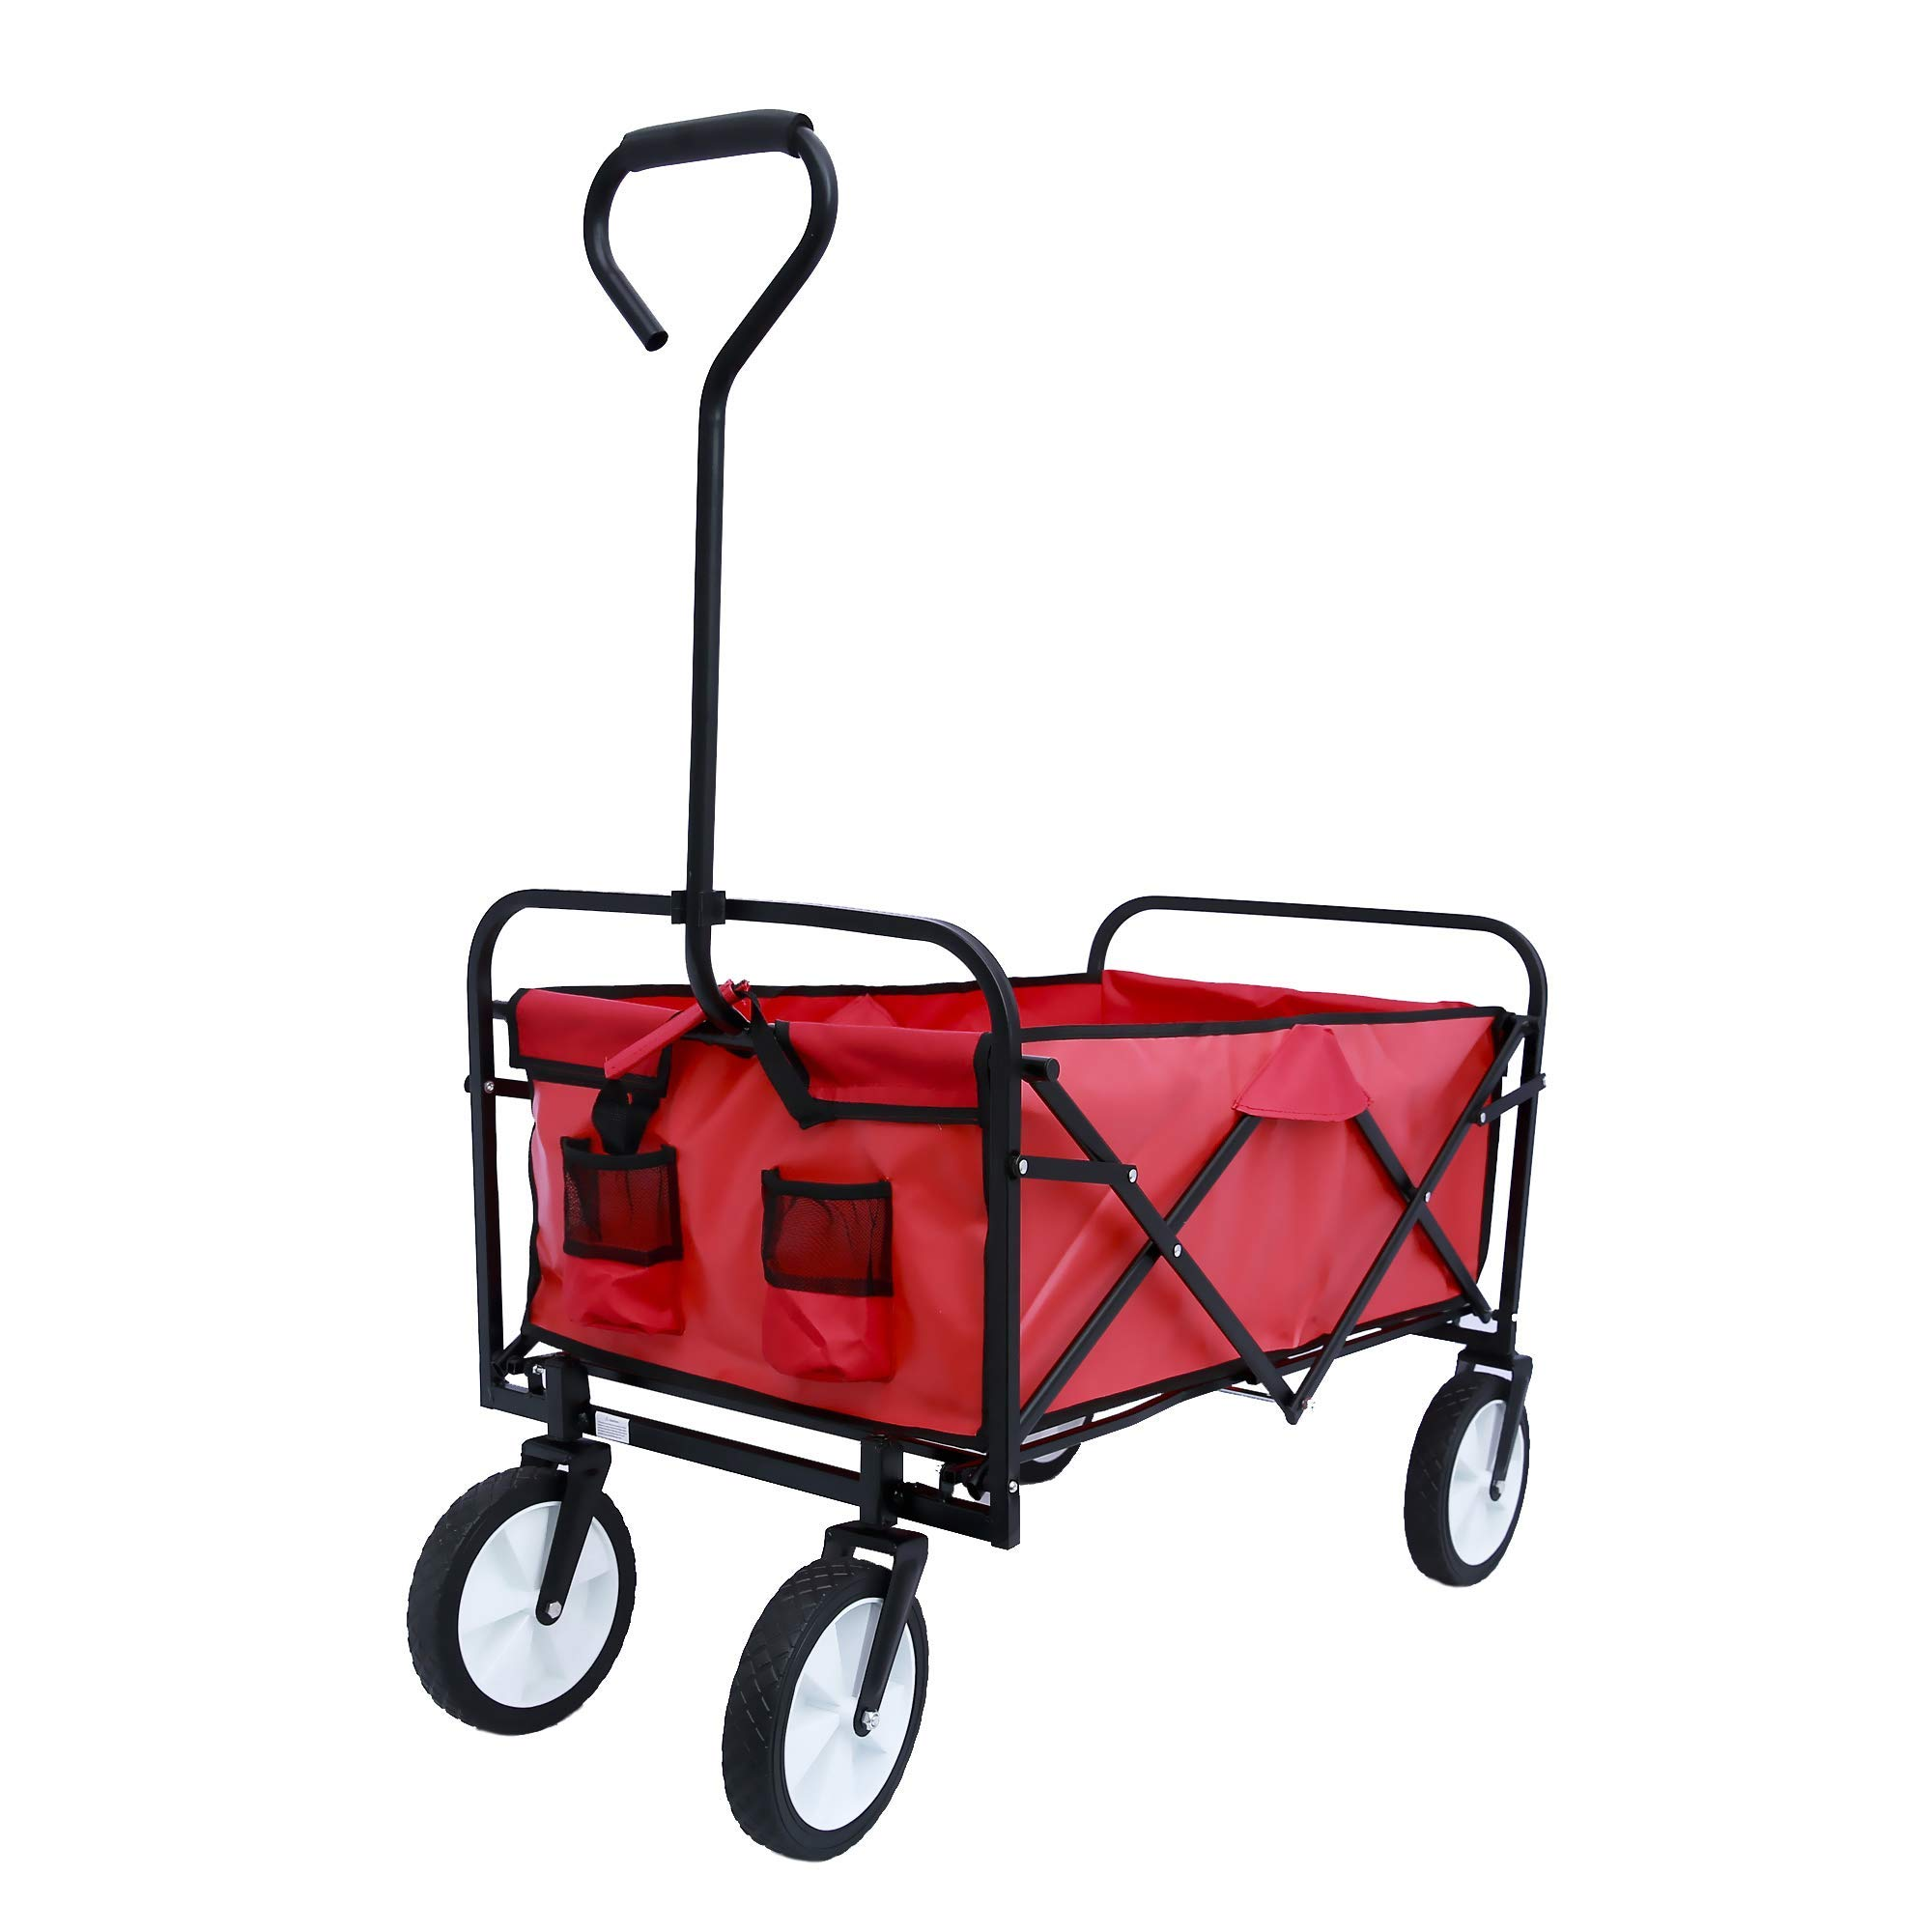 ALI VIRGO Collapsible Wagon, Folding Camping Wheelbarrows,Outdoor Garden Shopping Beach Heavy Duty Utility Cart with All-Terrain Wheels, (Stylish Red) by ALI VIRGO